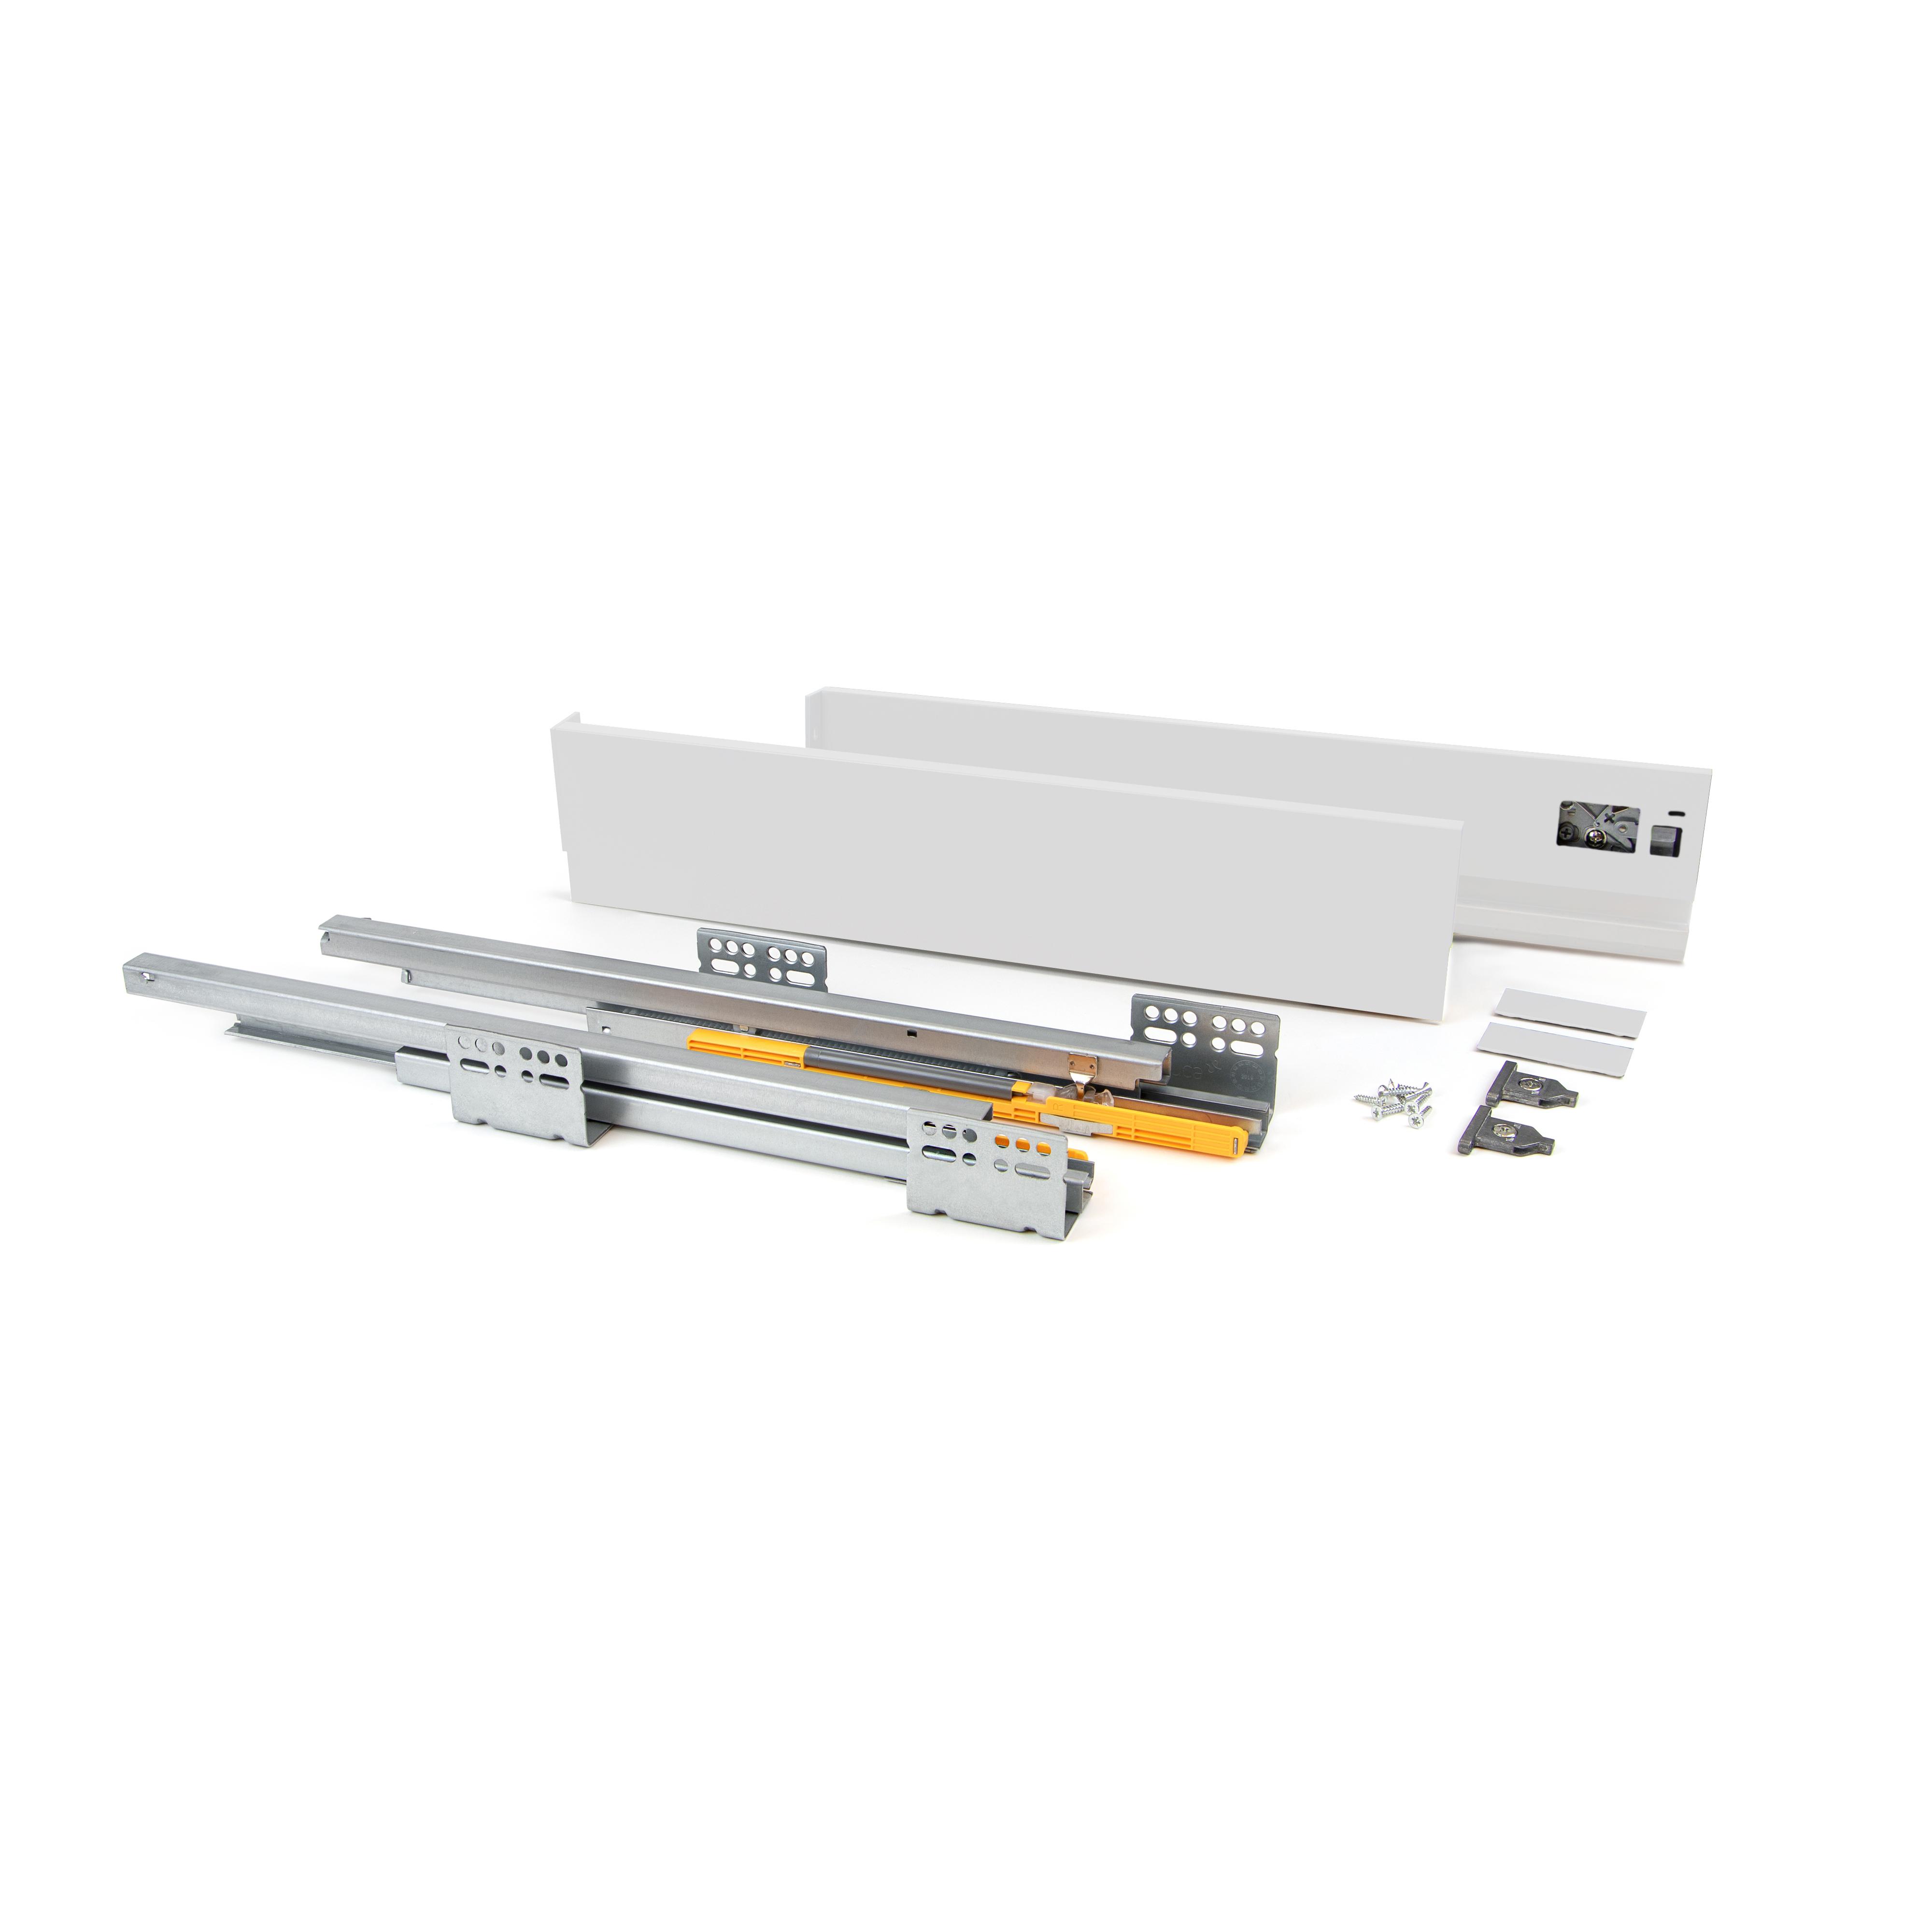 Emuca Kit cassetto per cucina Concept, altezza 105 mm, prof. 350 mm, chiusura soft, Acciaio, Bianco